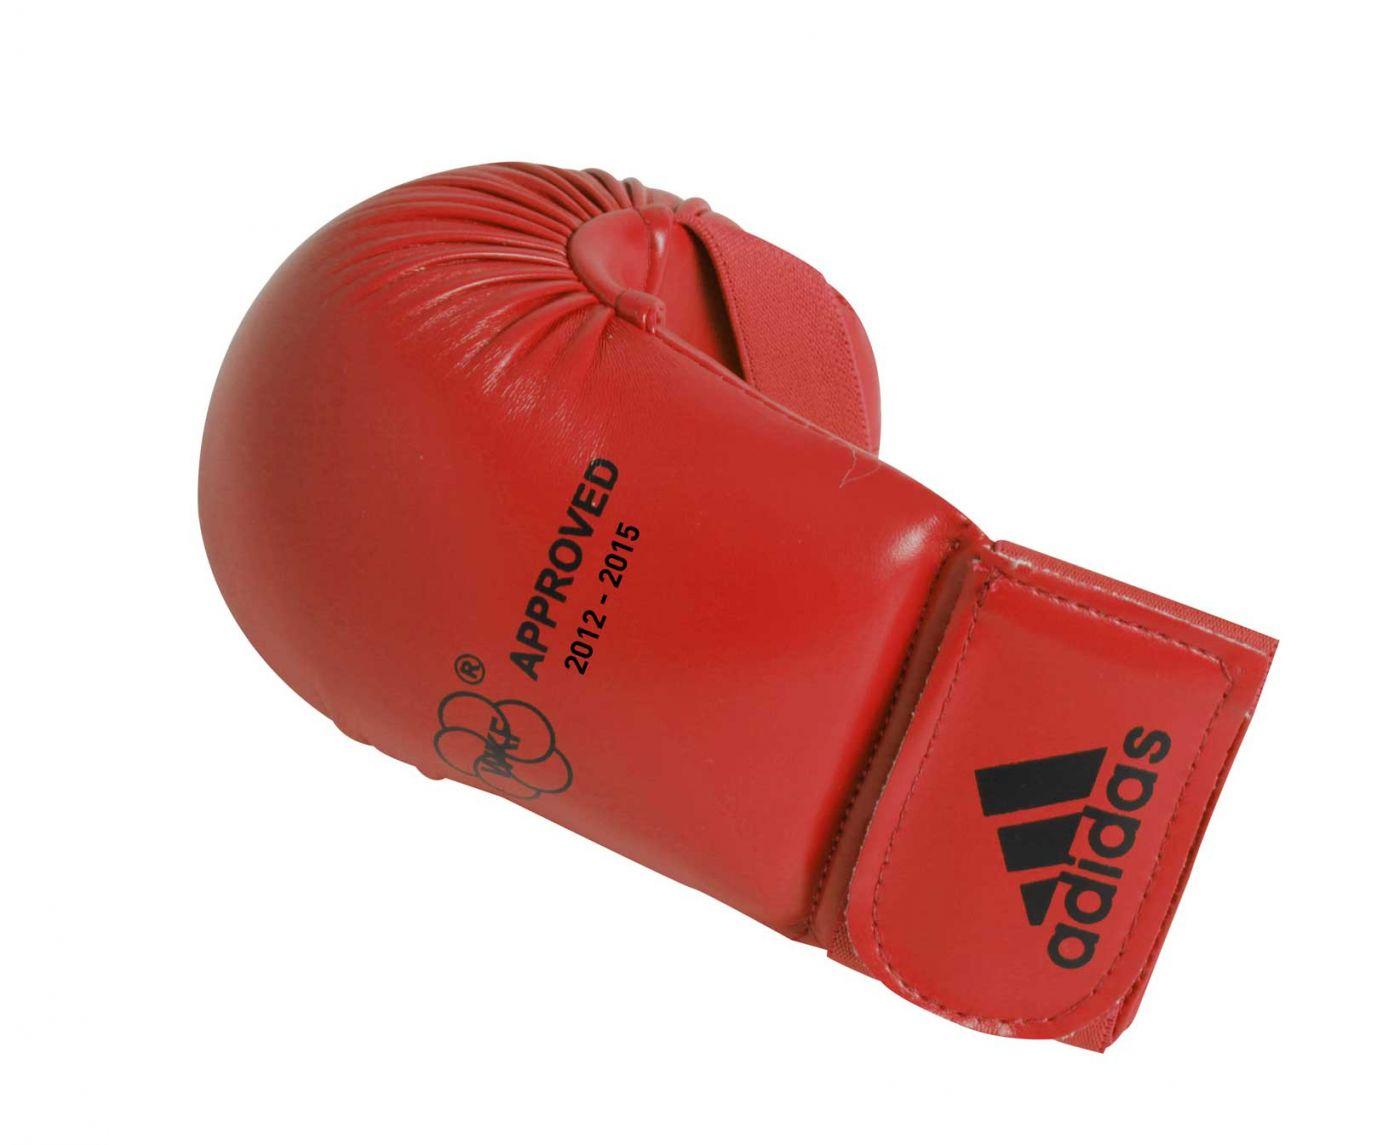 Накладки для карате WKF Bigger красные, размер XS, артикул 661.22